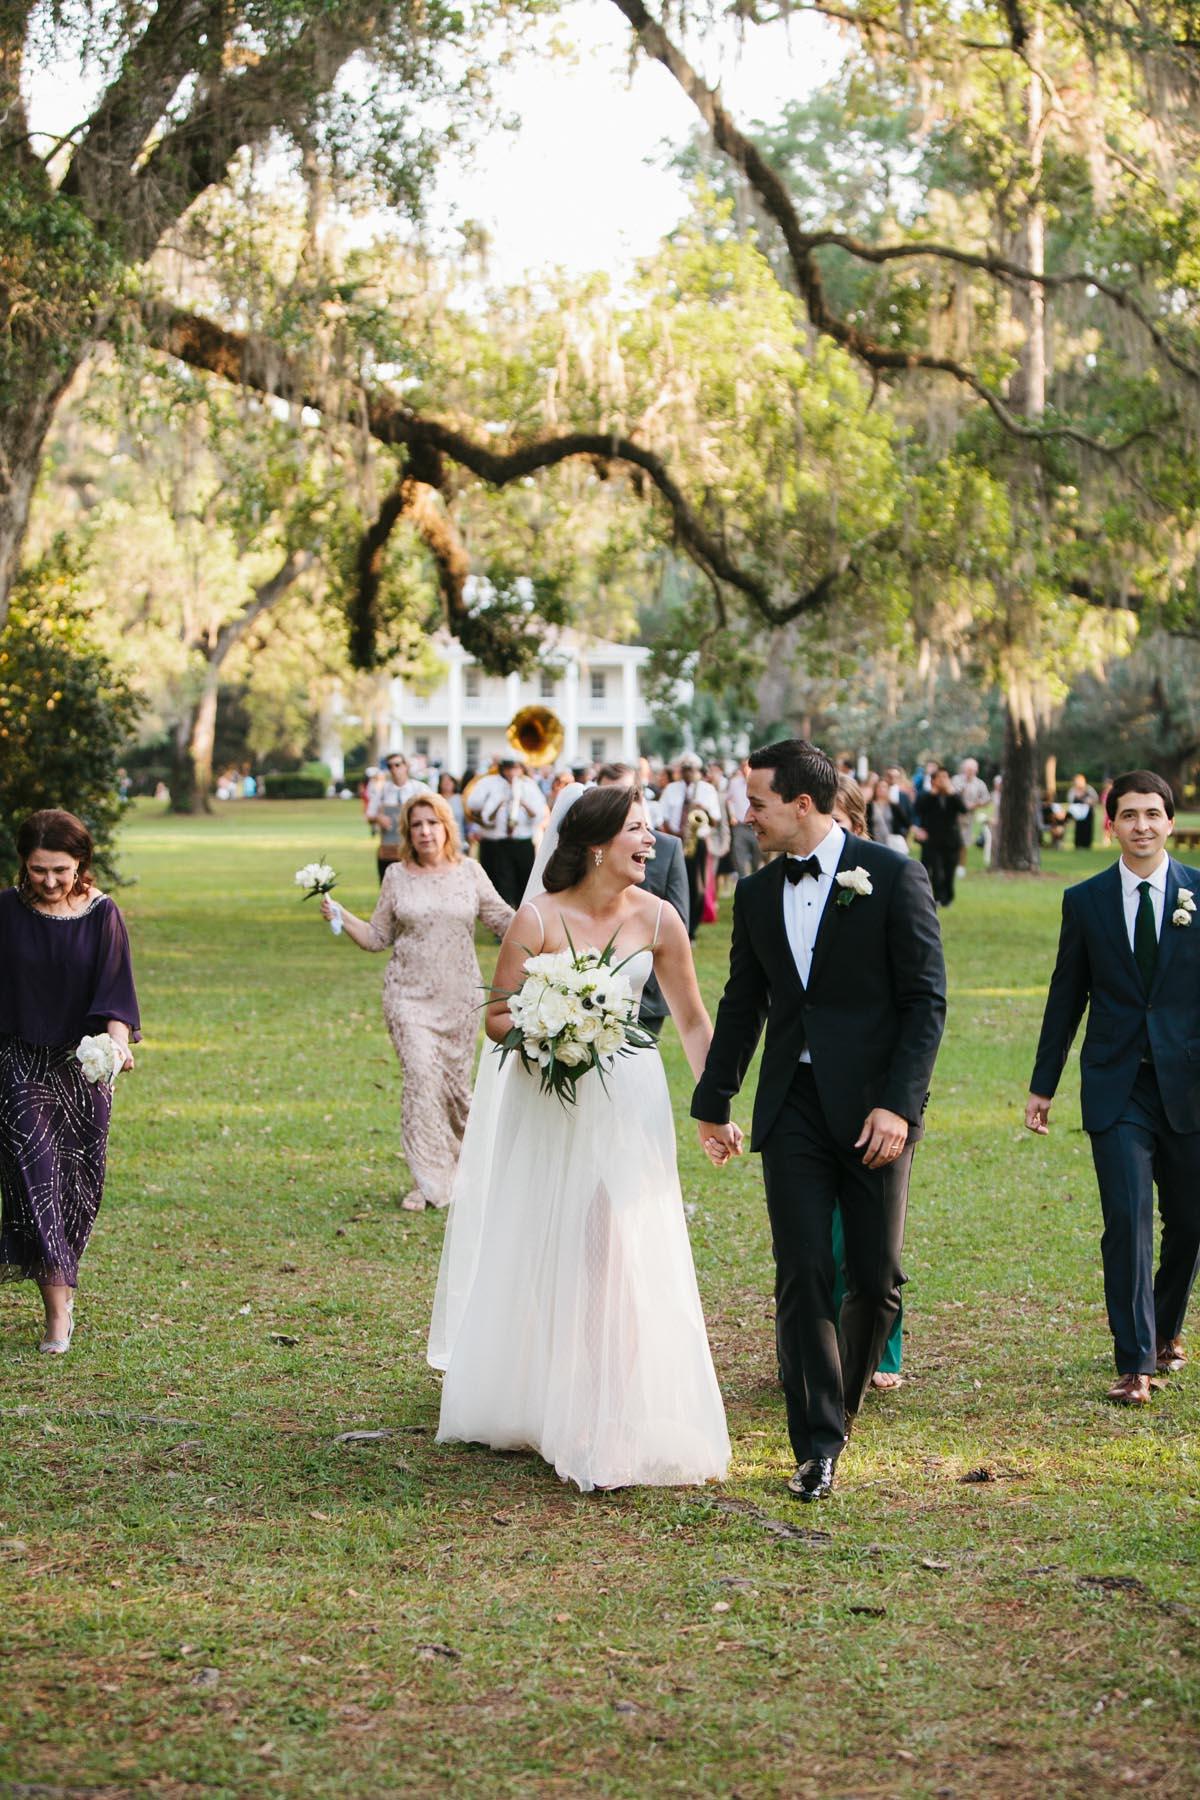 lowry wedding blog eden garden florida wedding-82